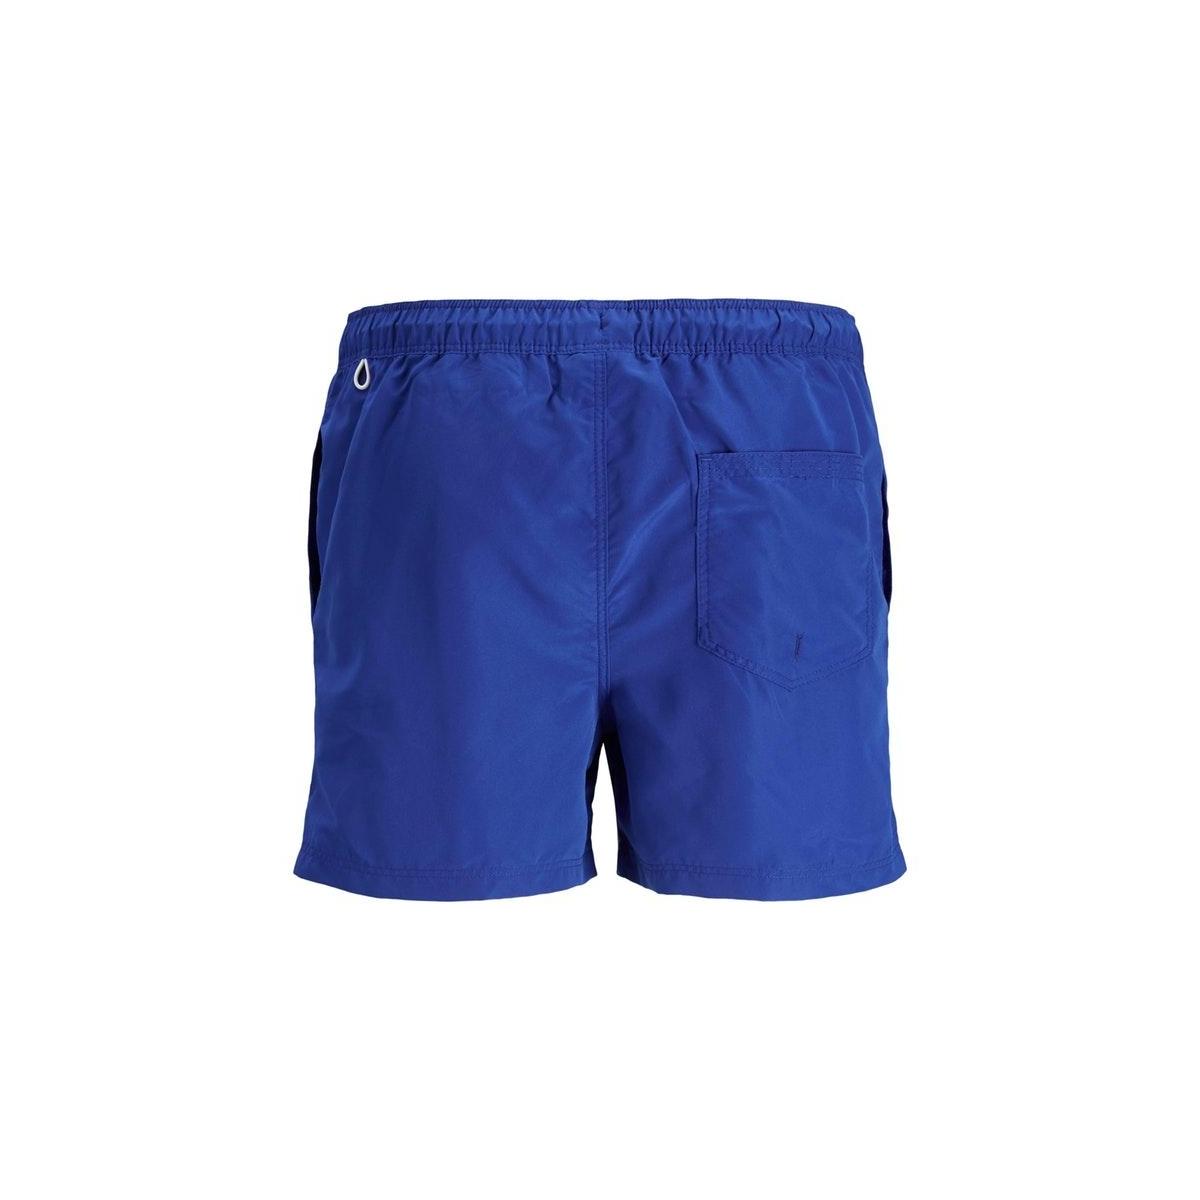 jjiaruba jjswim shorts akm sts 12166349 jack & jones korte broek surf the web